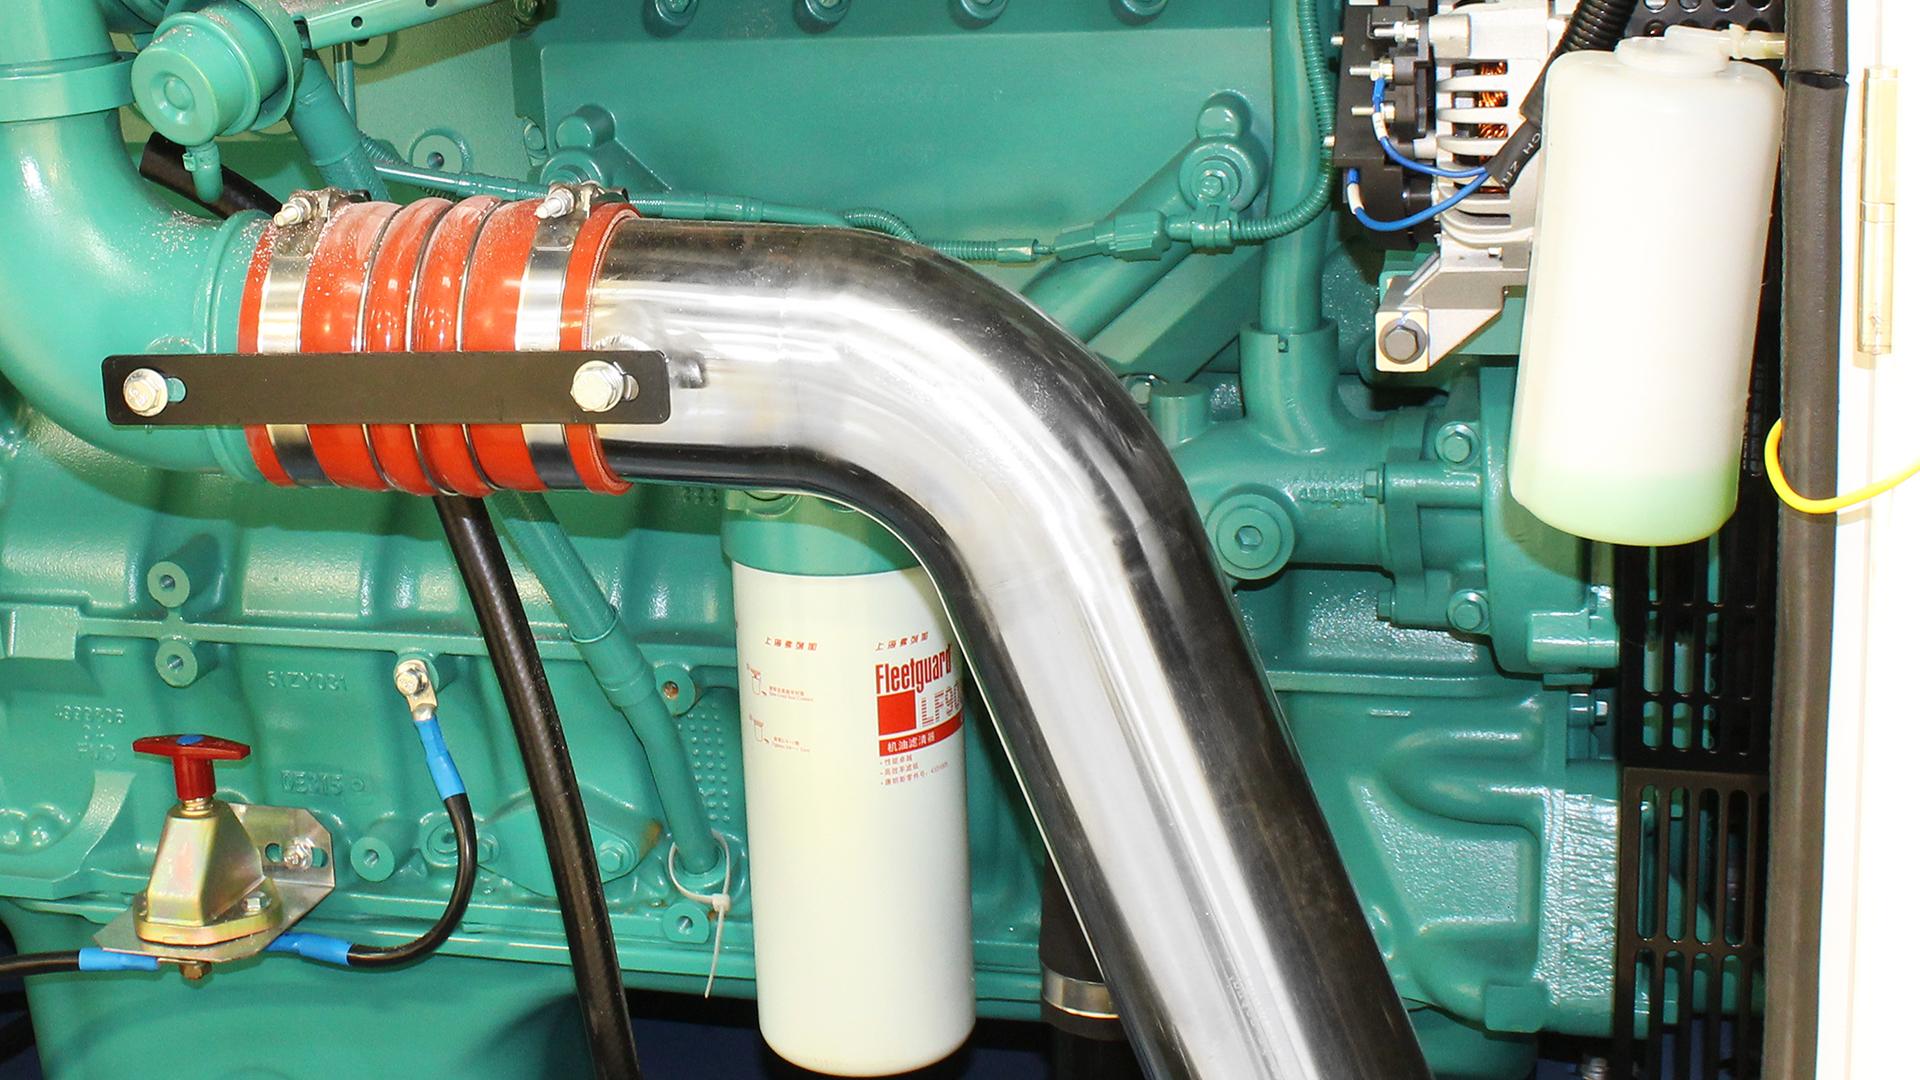 QSZ13 internal engine component from Cummins powered 550kVA generator